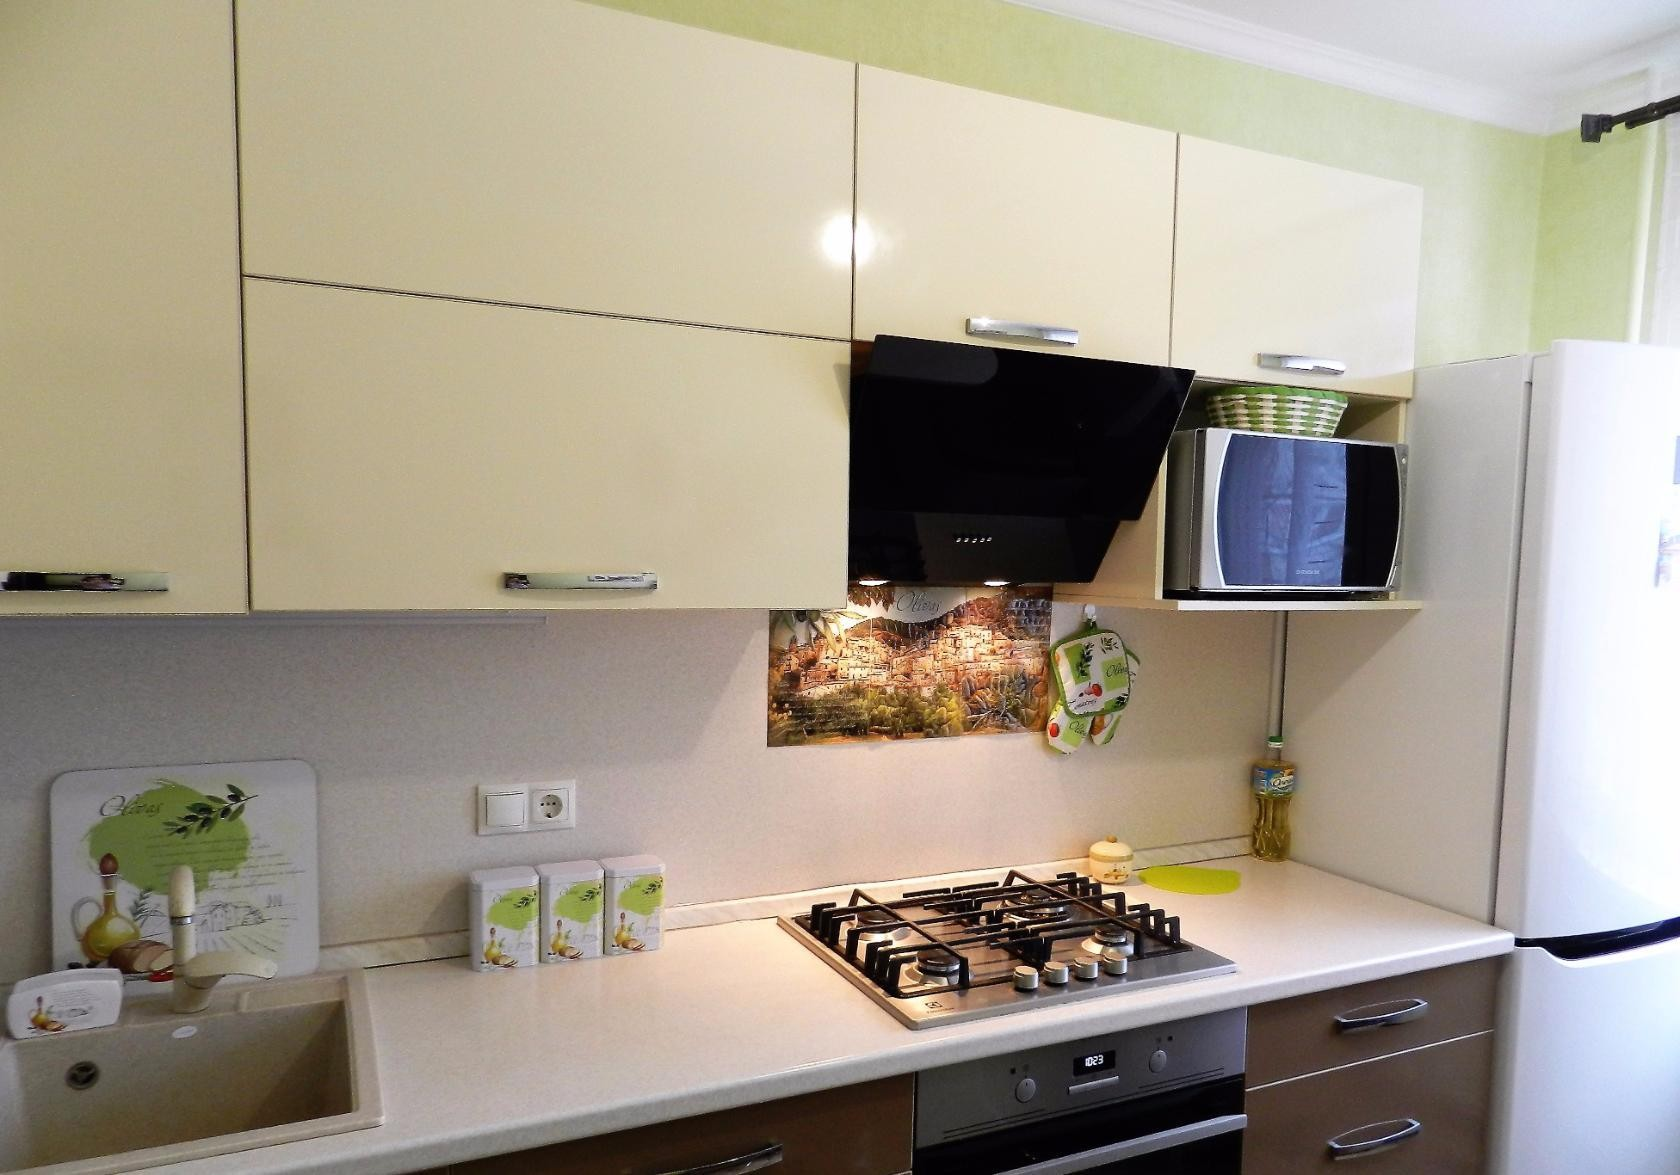 микроволновка на кухне варианты размещения фото